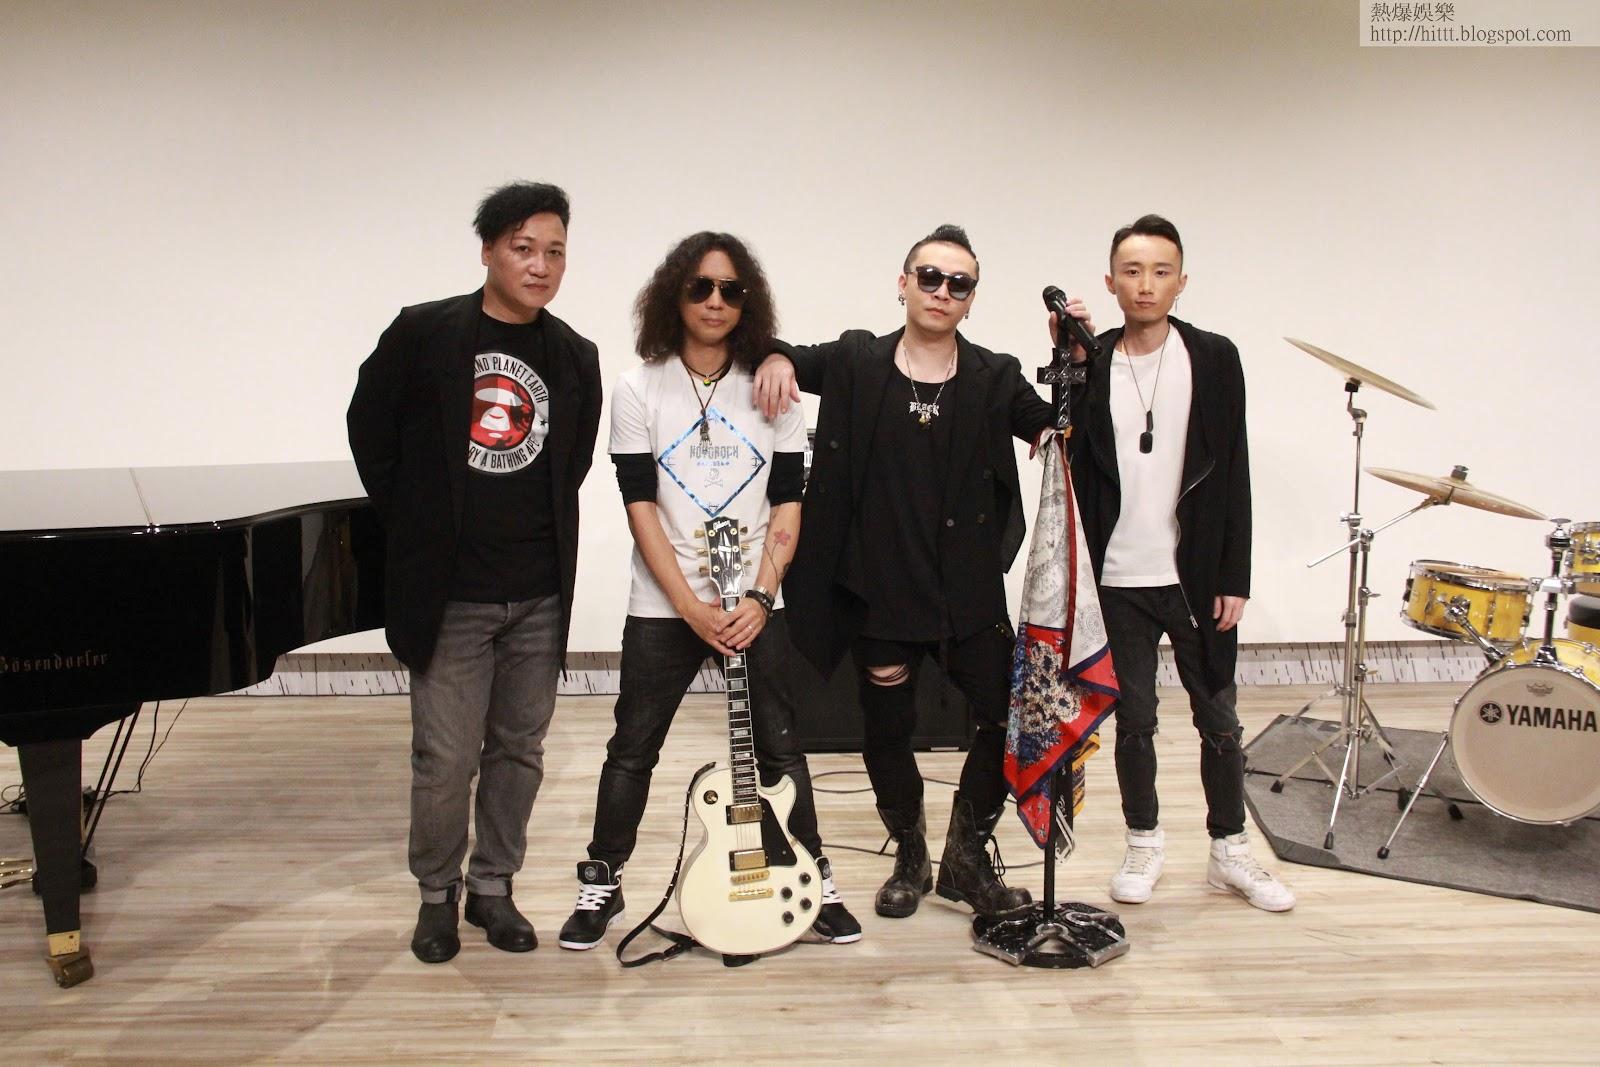 ZolarWind2.0早前為新歌《拳鋒》及《拳手》拍MV。